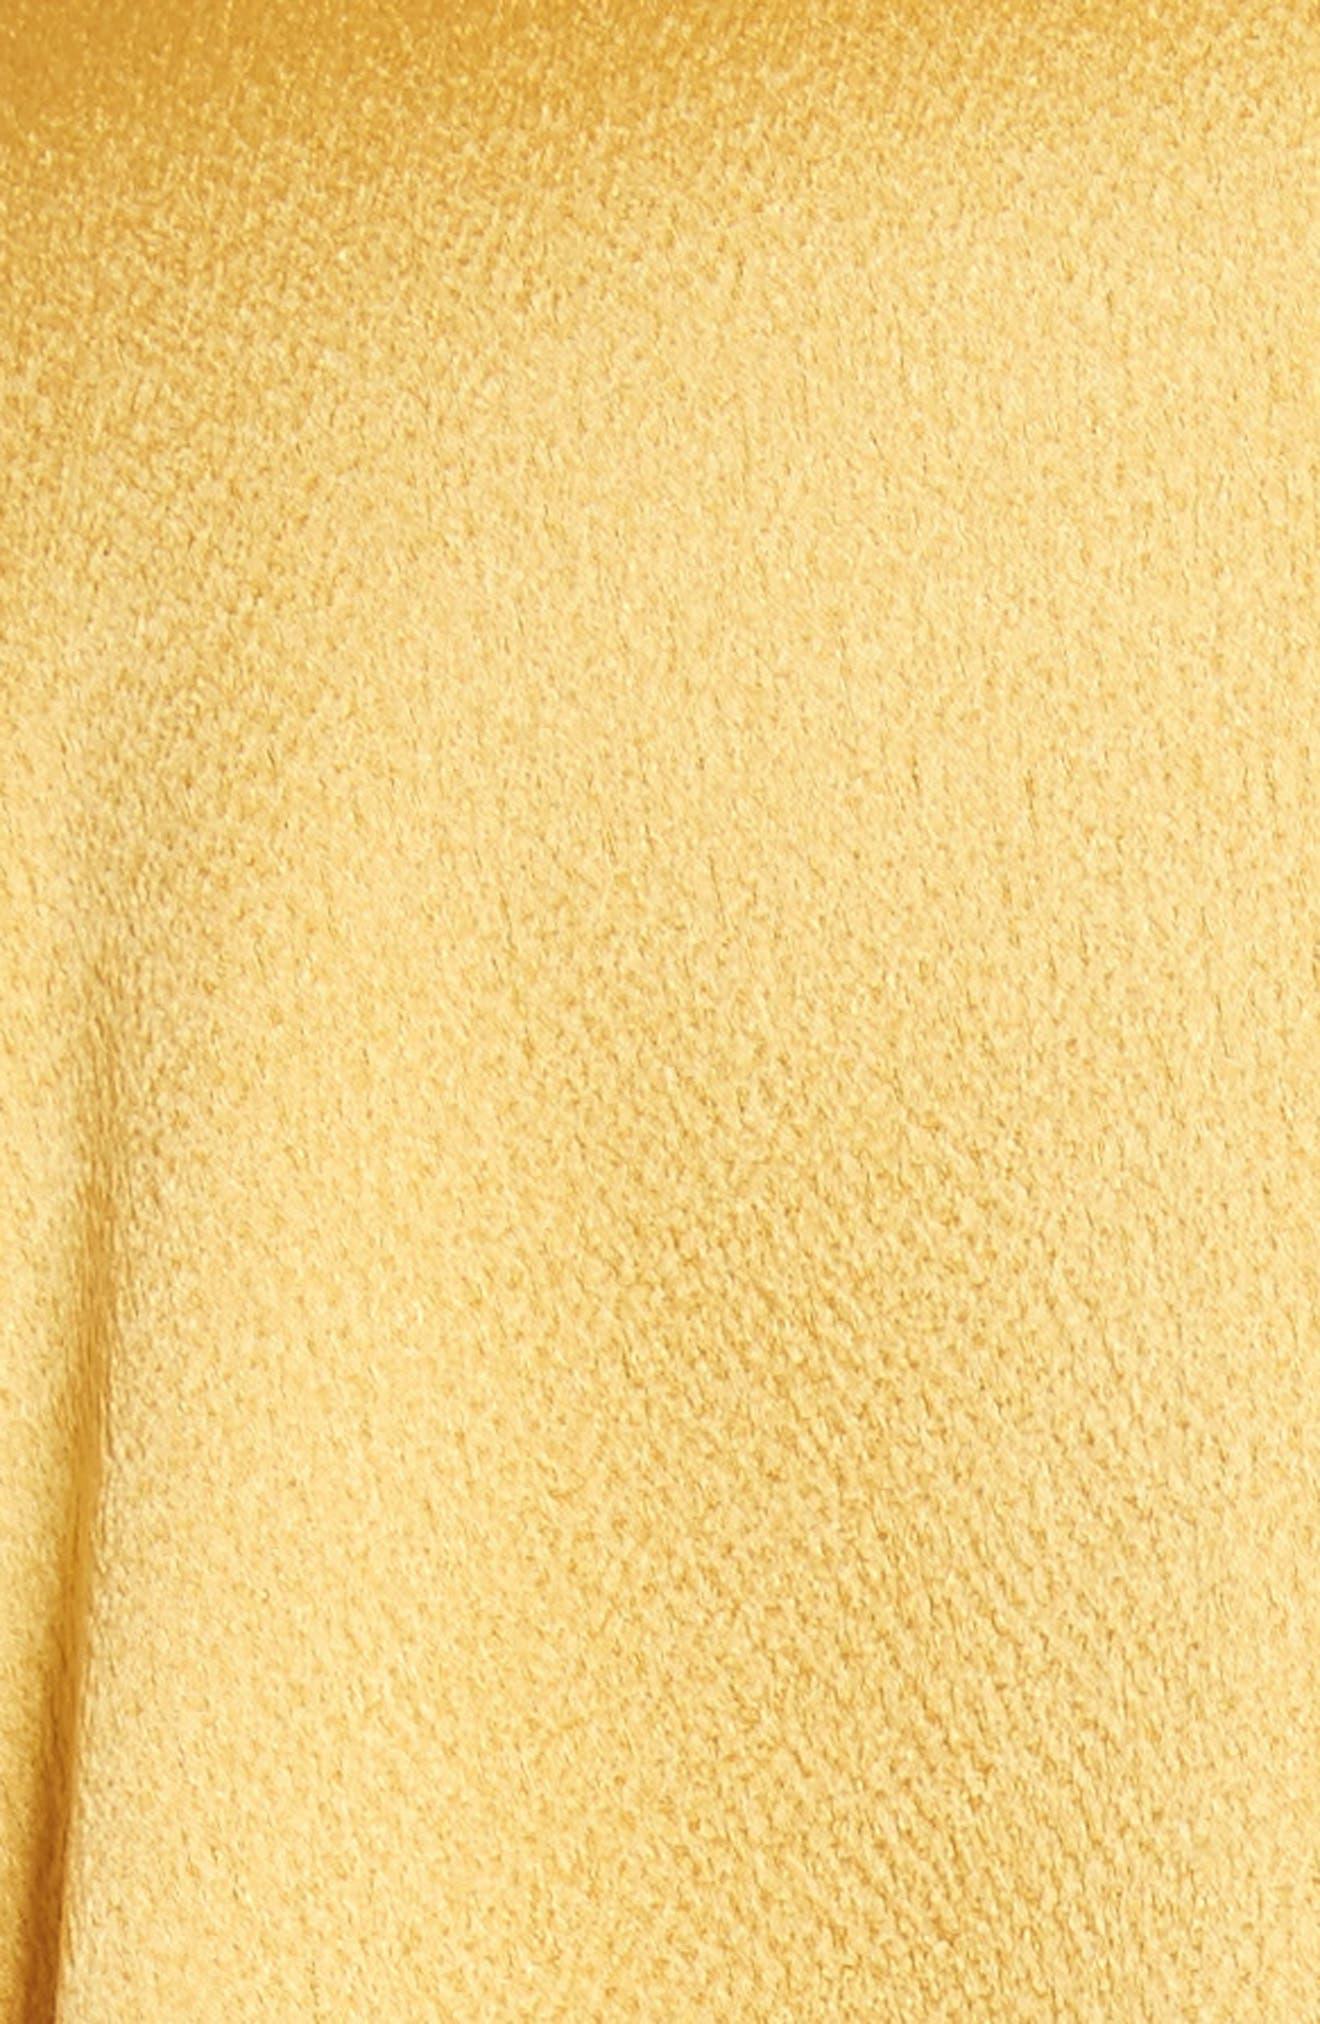 Hammered Satin Midi Dress,                             Alternate thumbnail 5, color,                             Canary Yellow